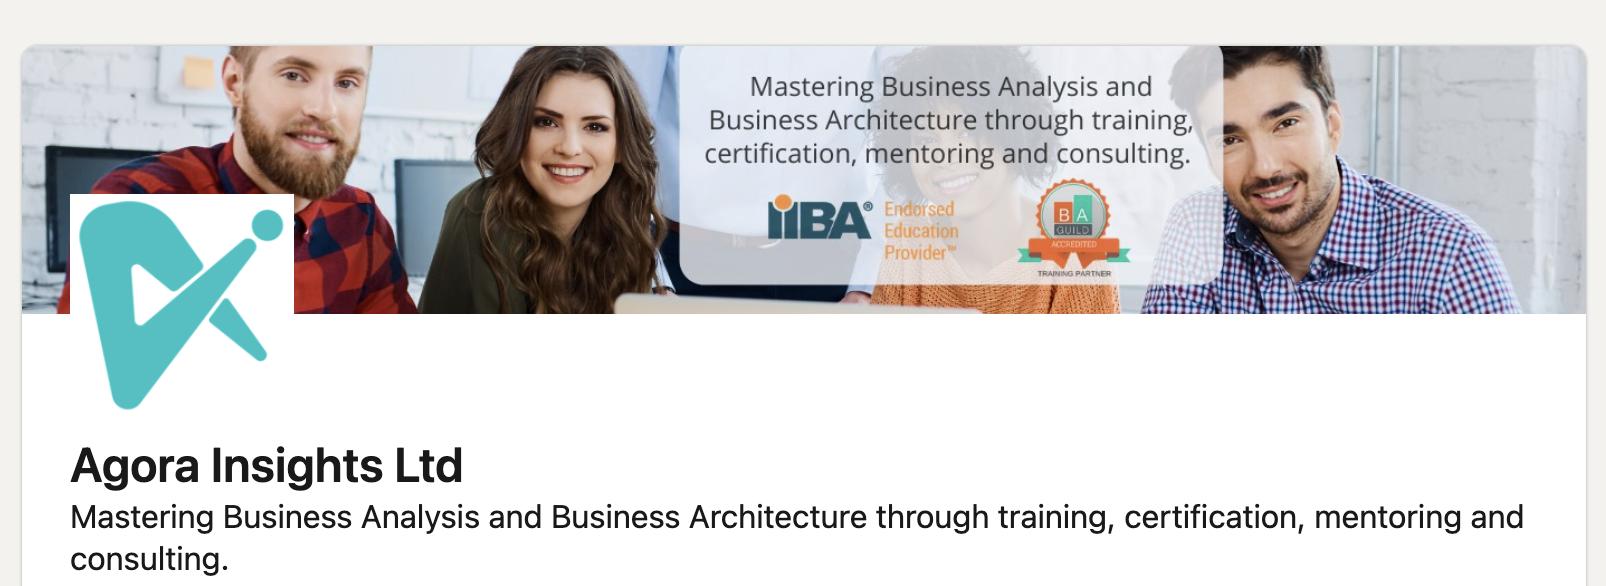 Agora Insights IIBA and Architecture Guild endorsed provider